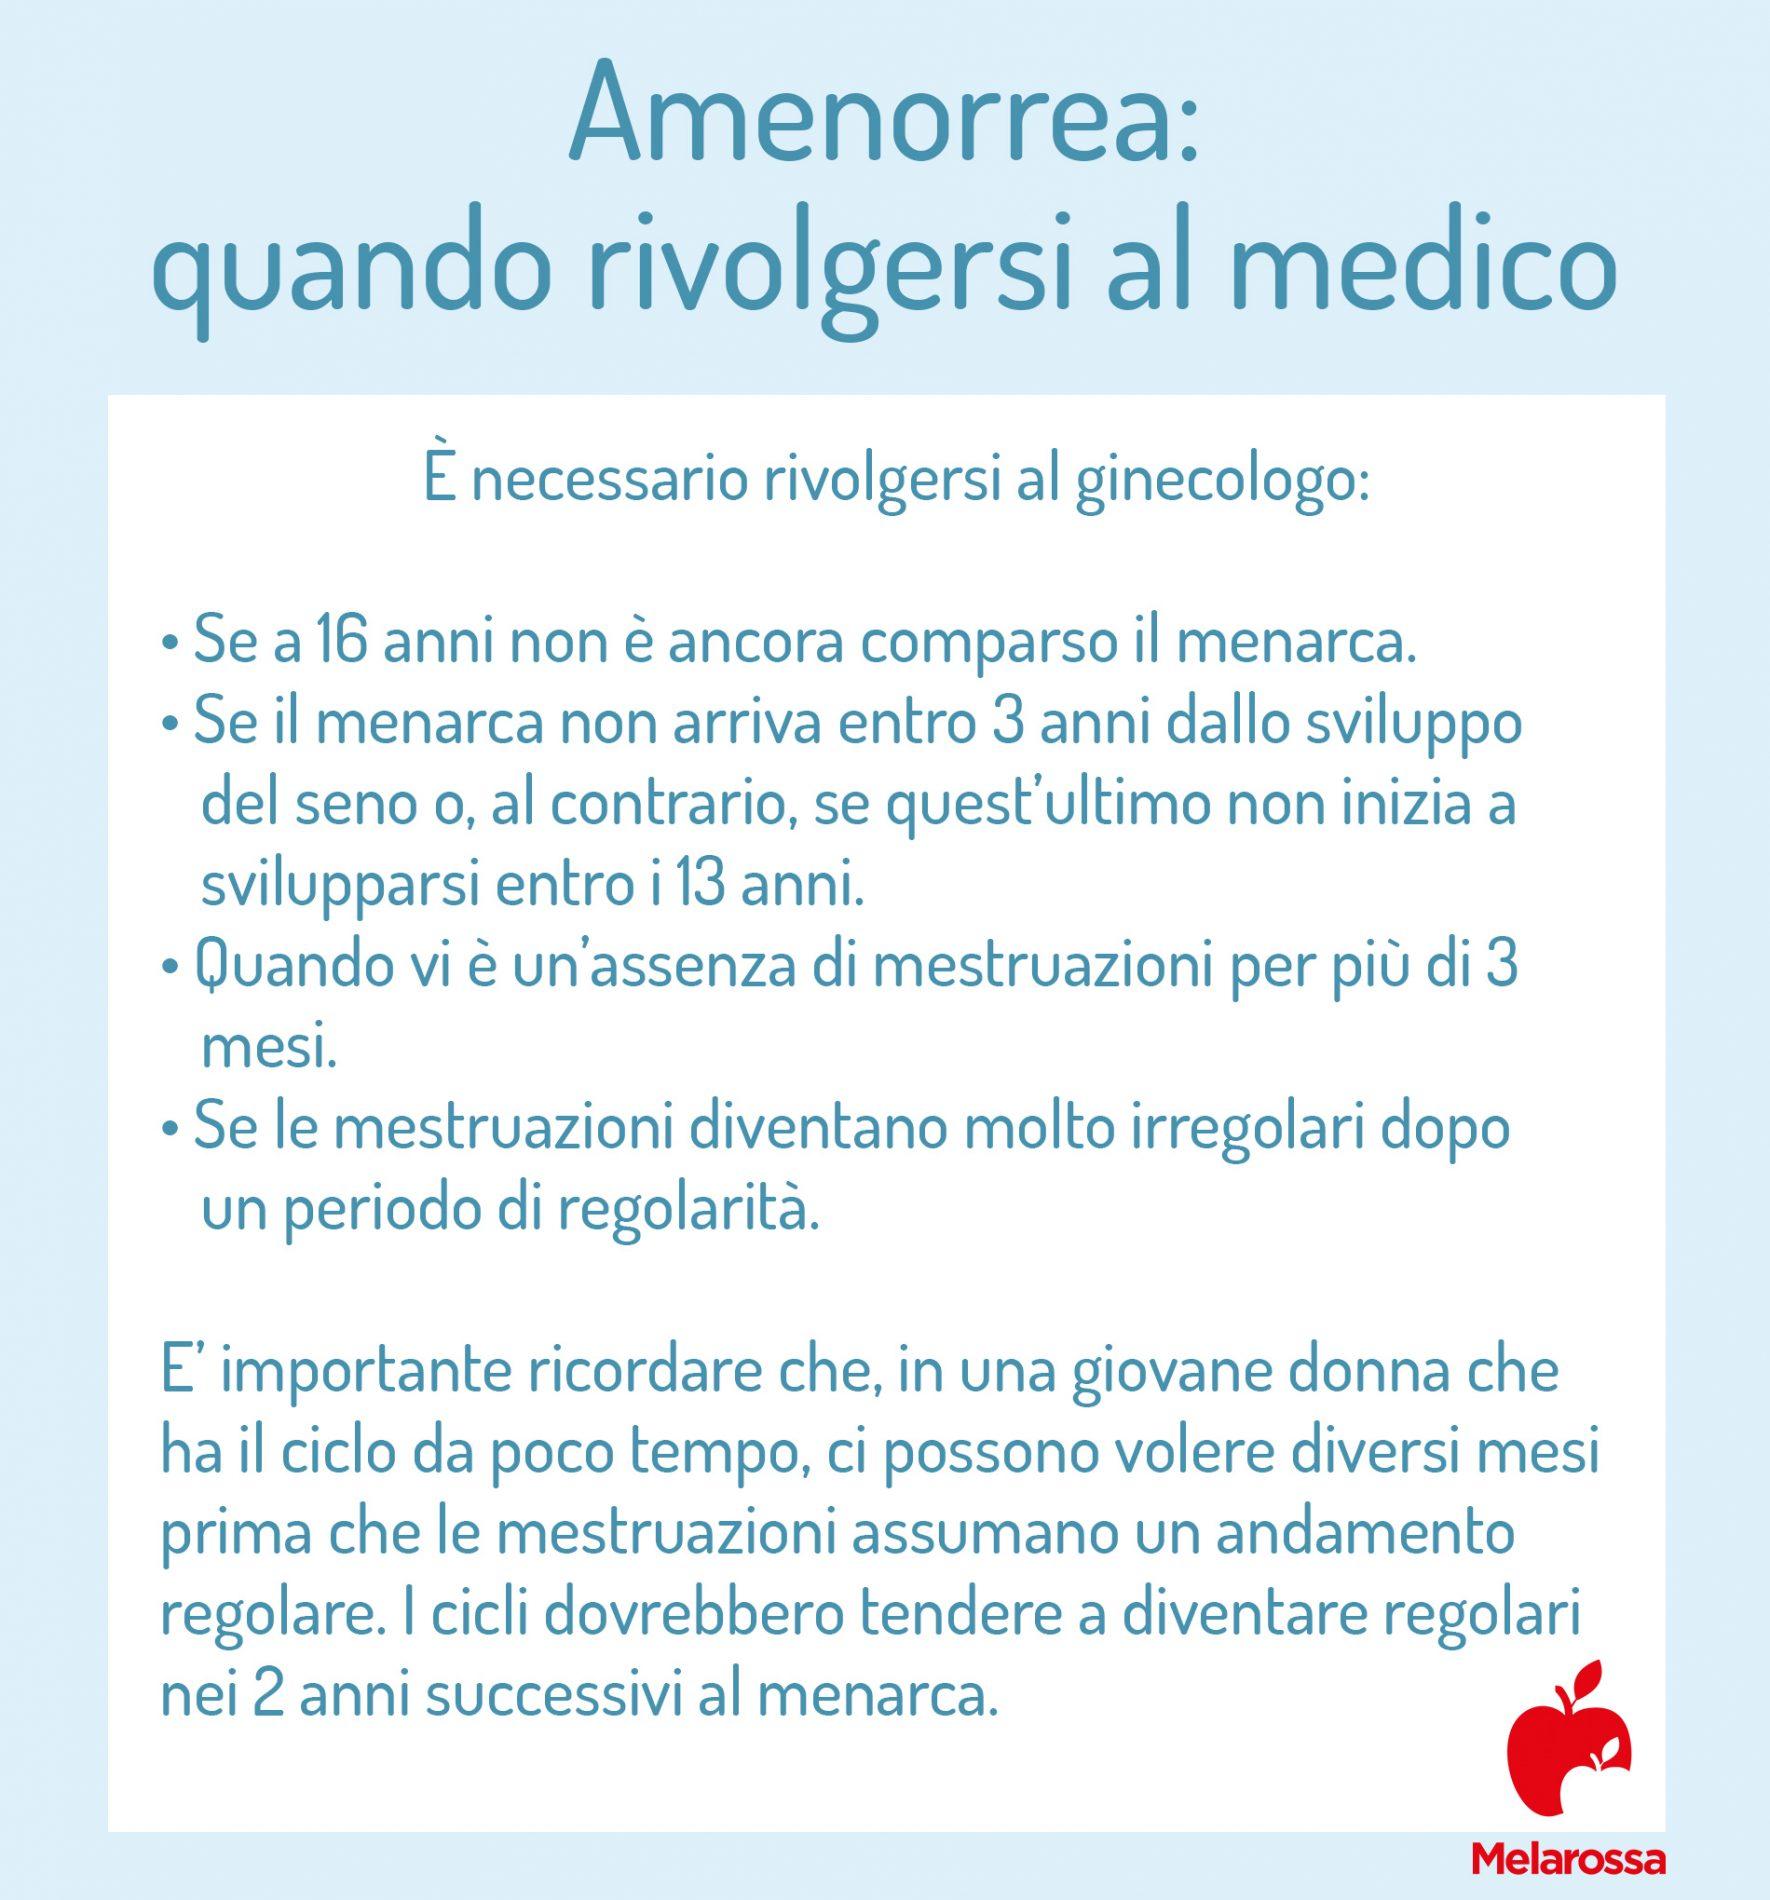 Amenorrea: quando rivolgersi al medico